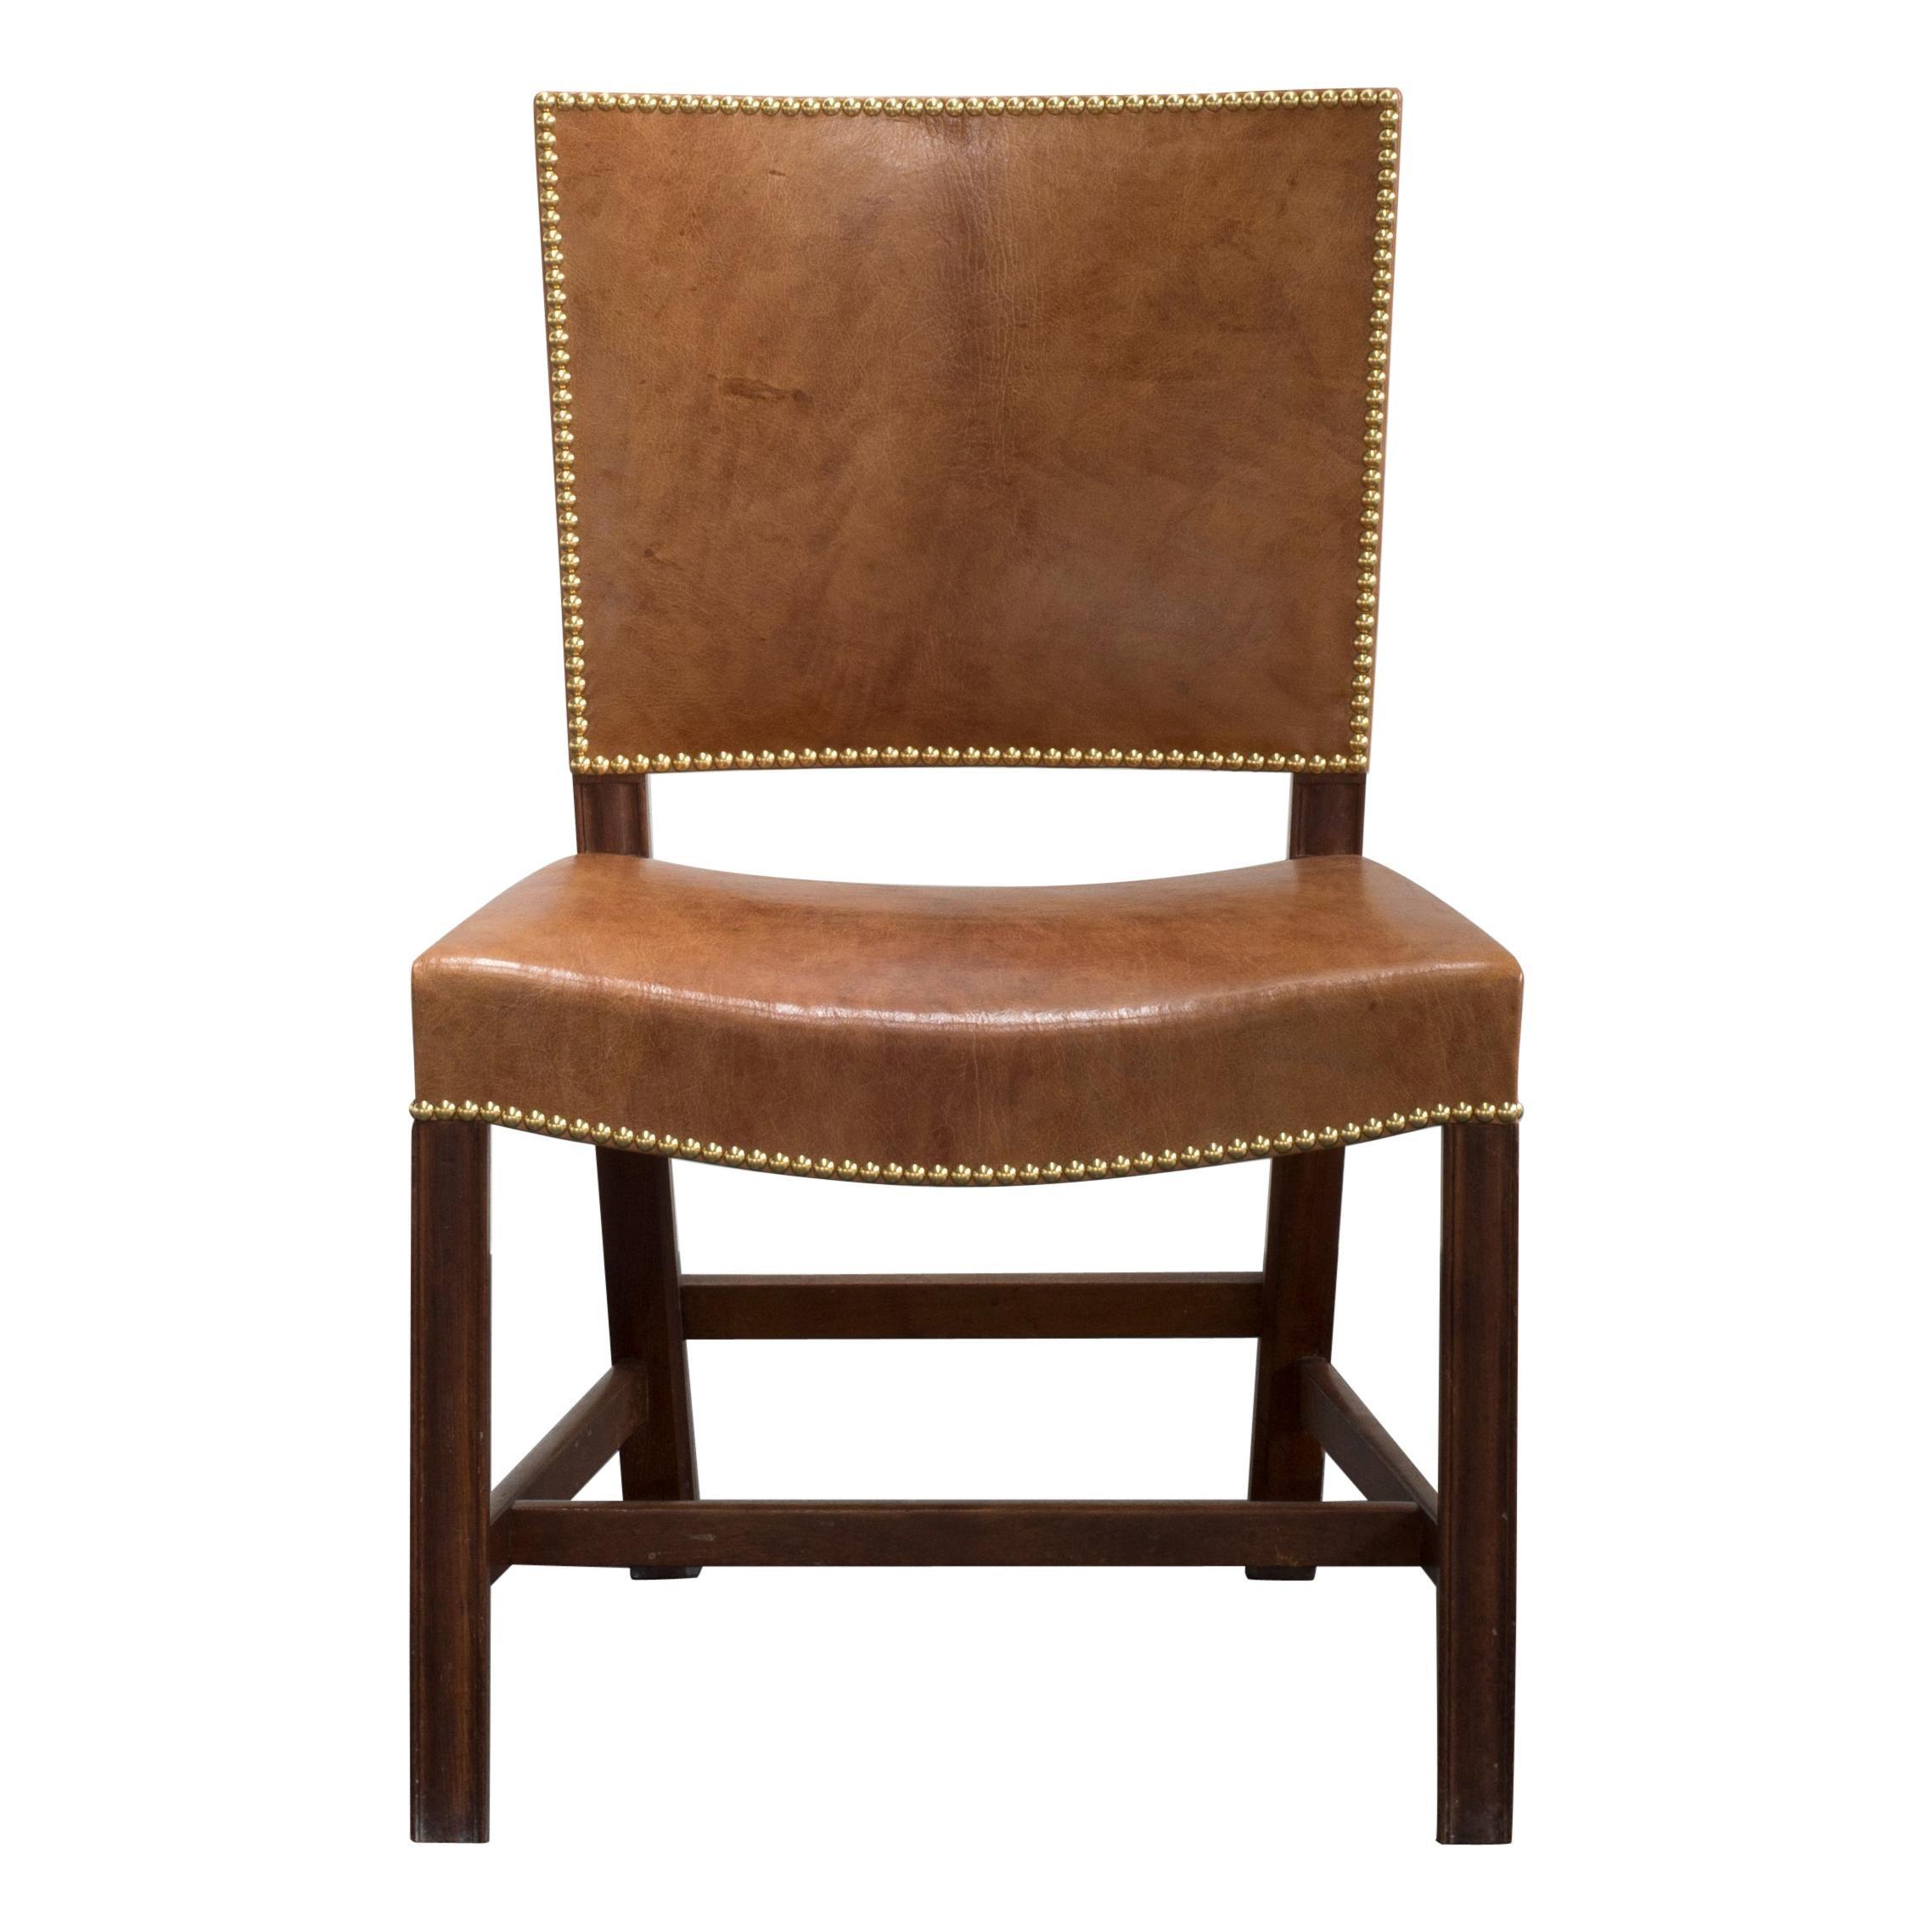 Kaare Klint Red Chair for Rud, Rasmussen